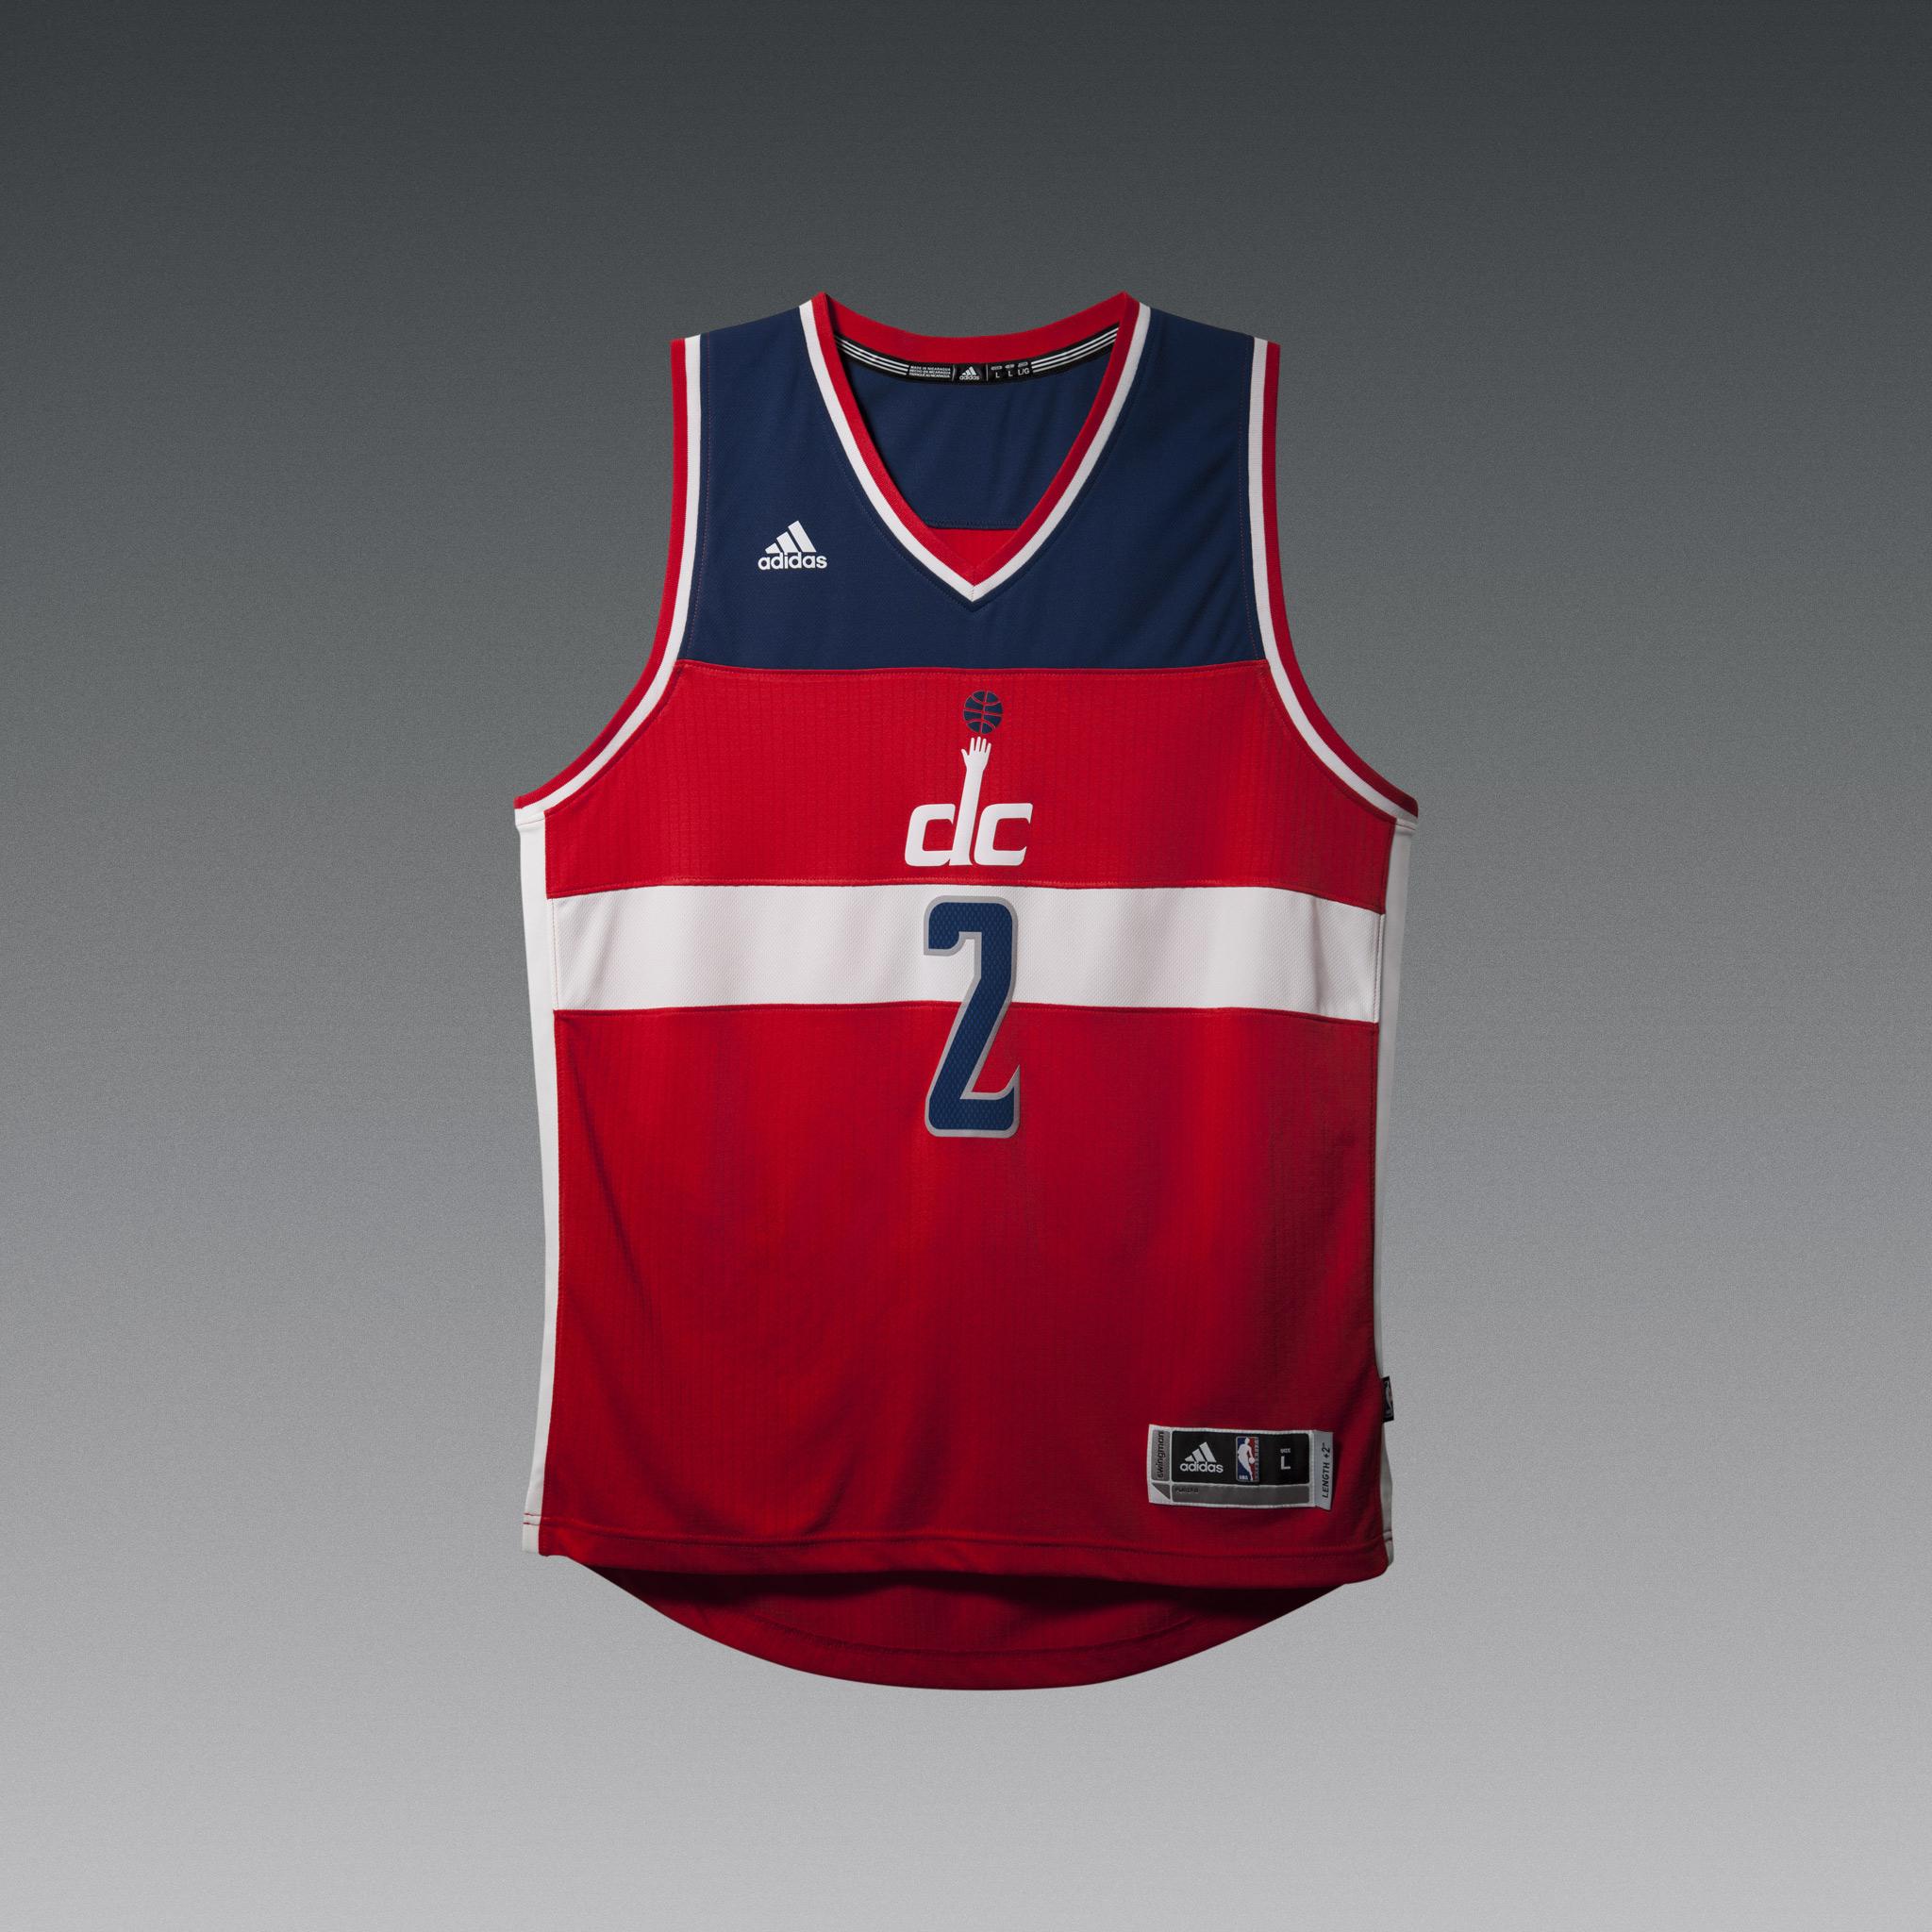 adidas NBA Christmas Day, Washinton Wizards